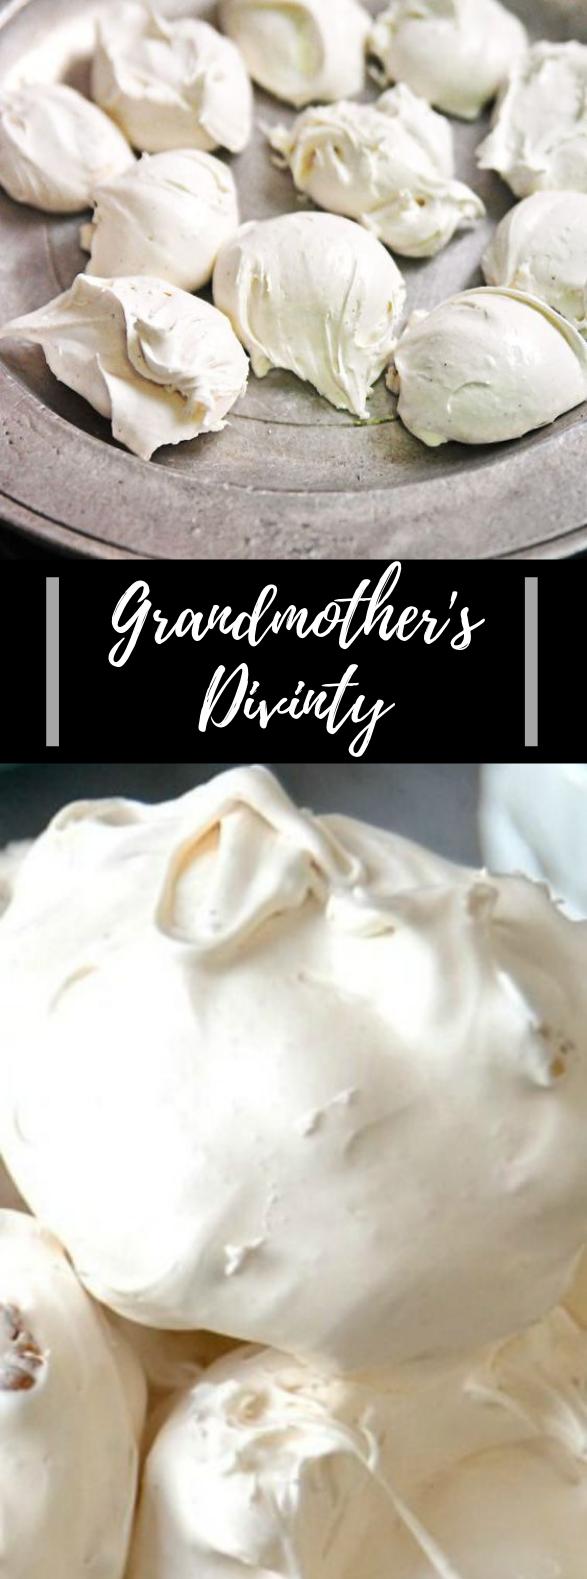 Divinity Recipe #Candy #Dessert